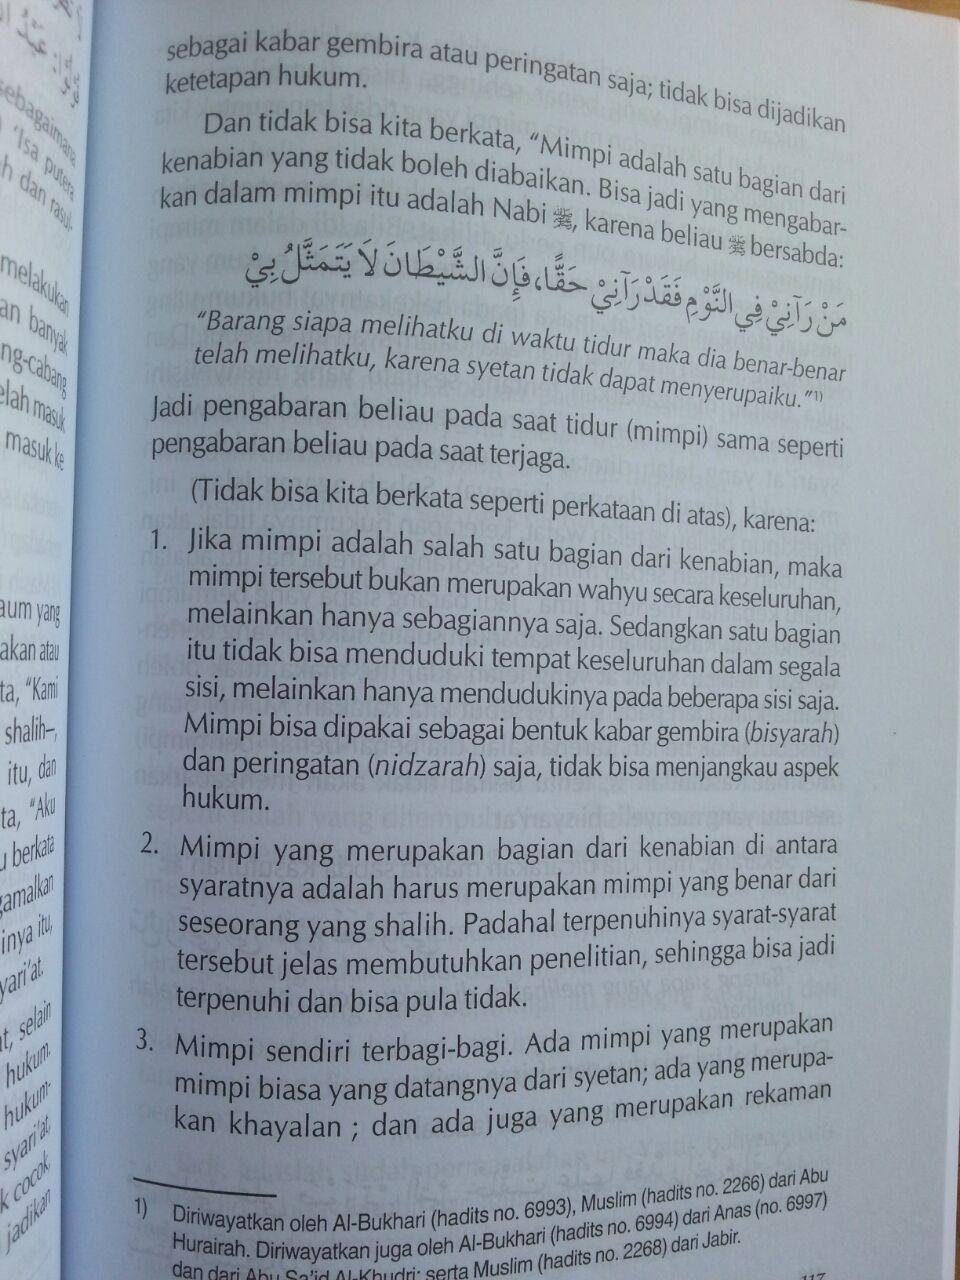 Buku Ringkasan Al-I'tisham (Membedah Seluk Beluk Bidah) isi 3